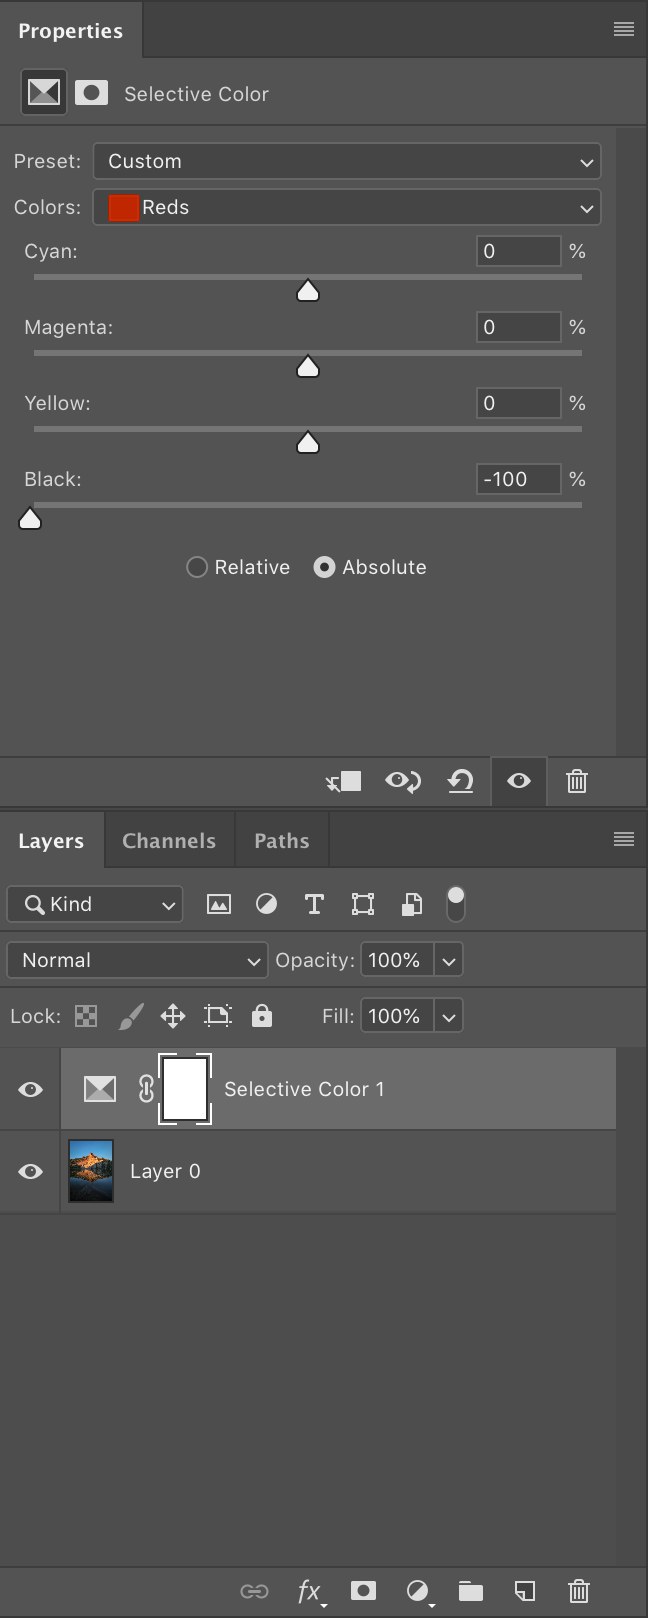 Photoshop selective color adjustment